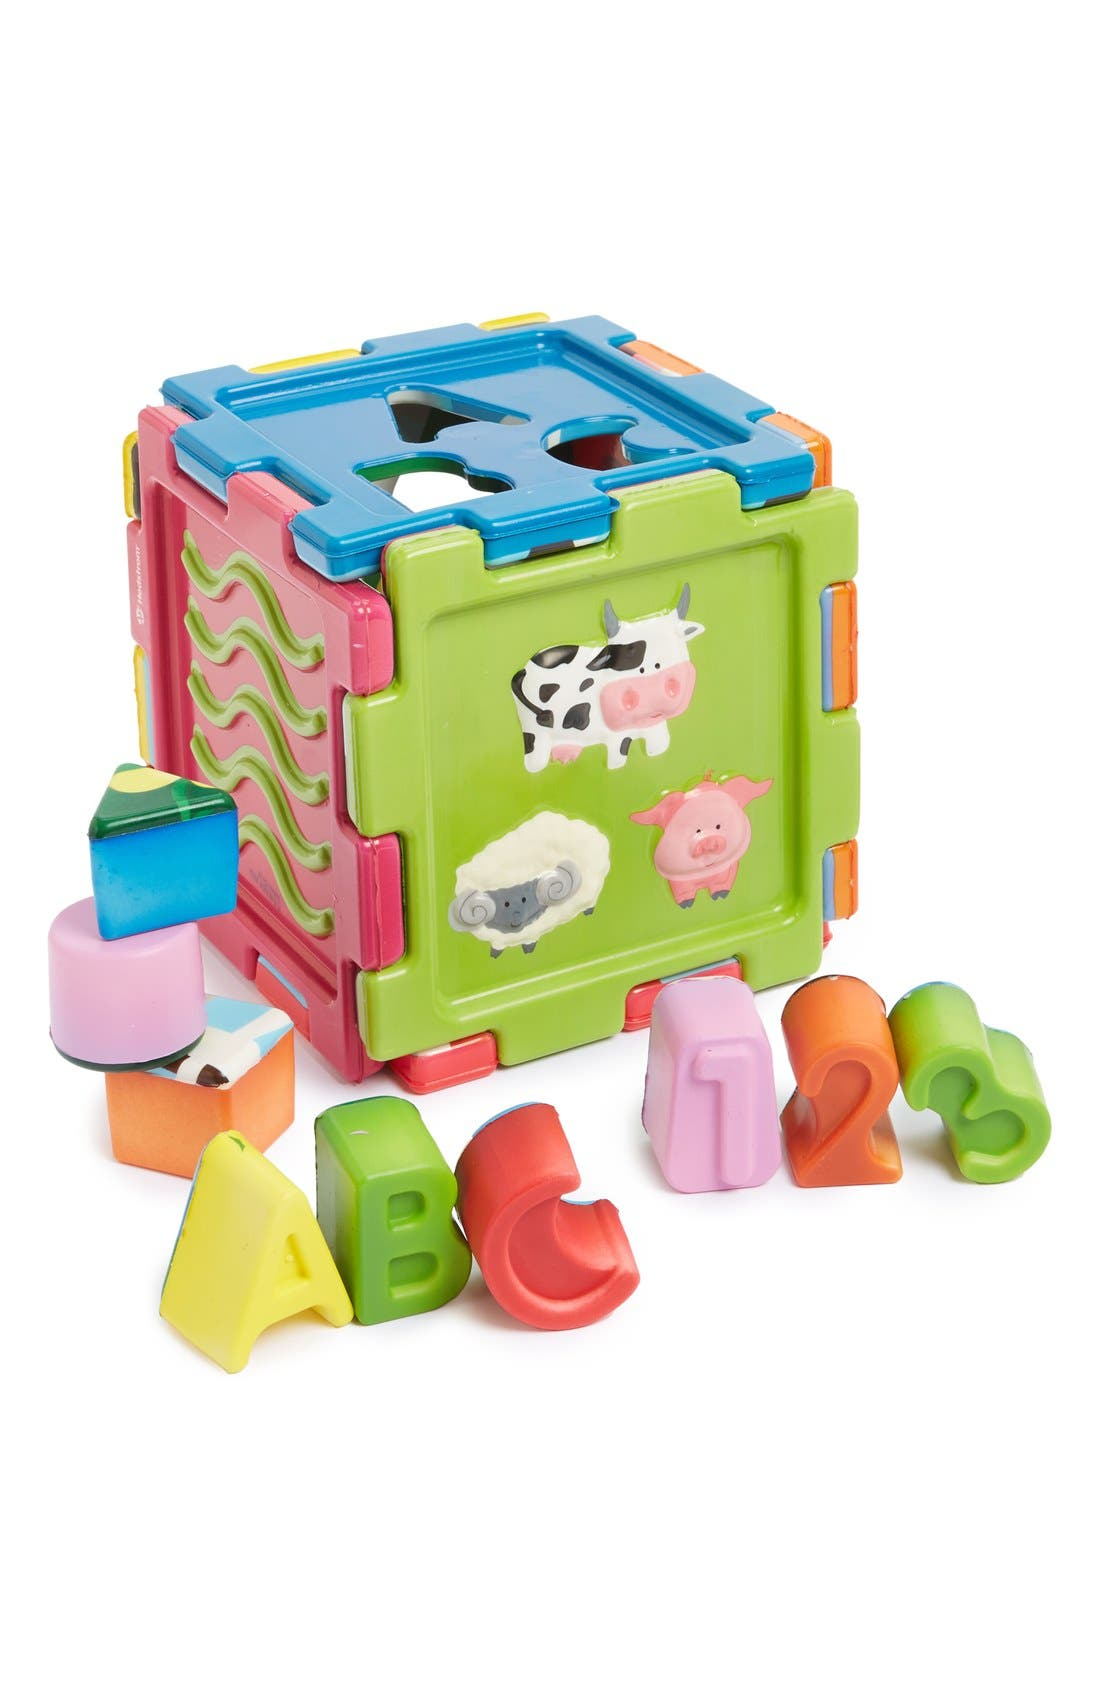 Hedstrom 'Sensory Cube' Toy Set